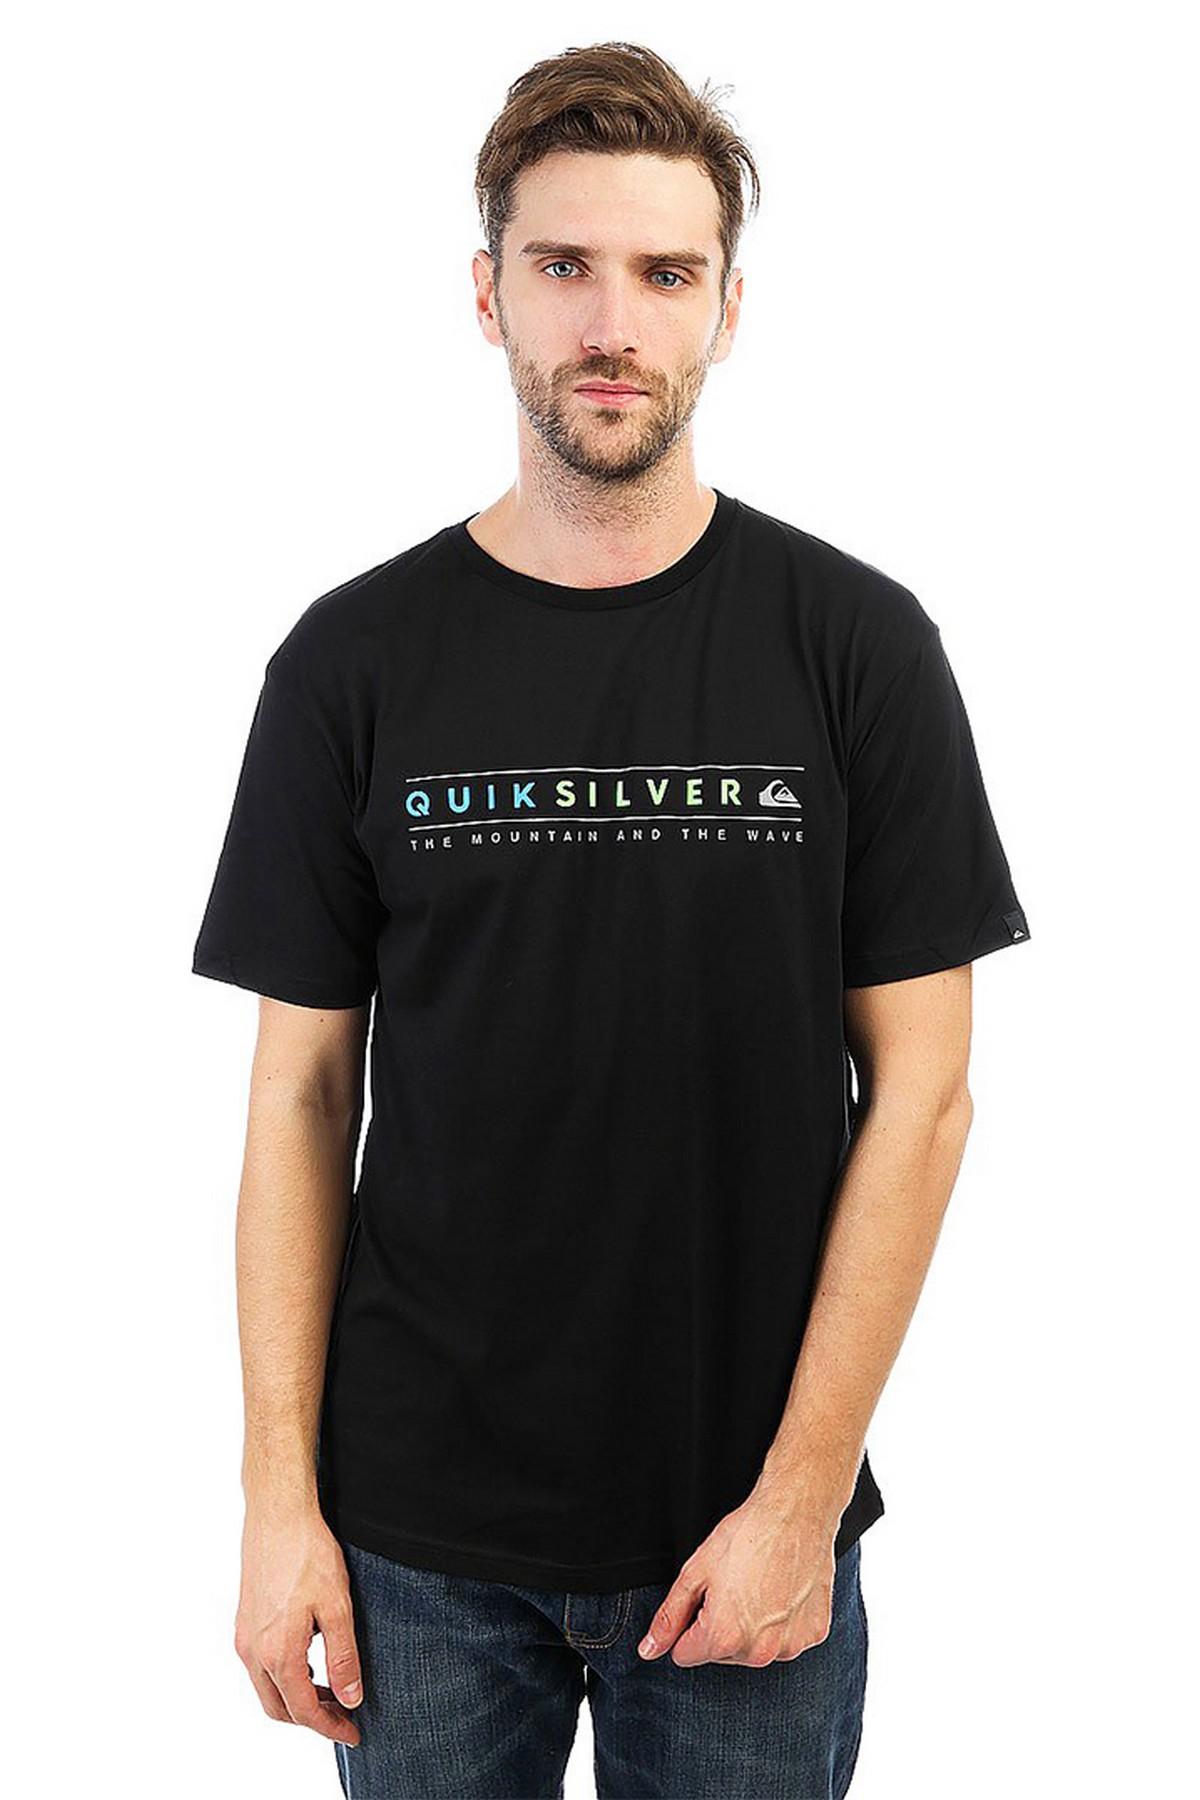 Quiksilver Always Clean M Tees T-Shirt (EQYZT04305-KVJ0)